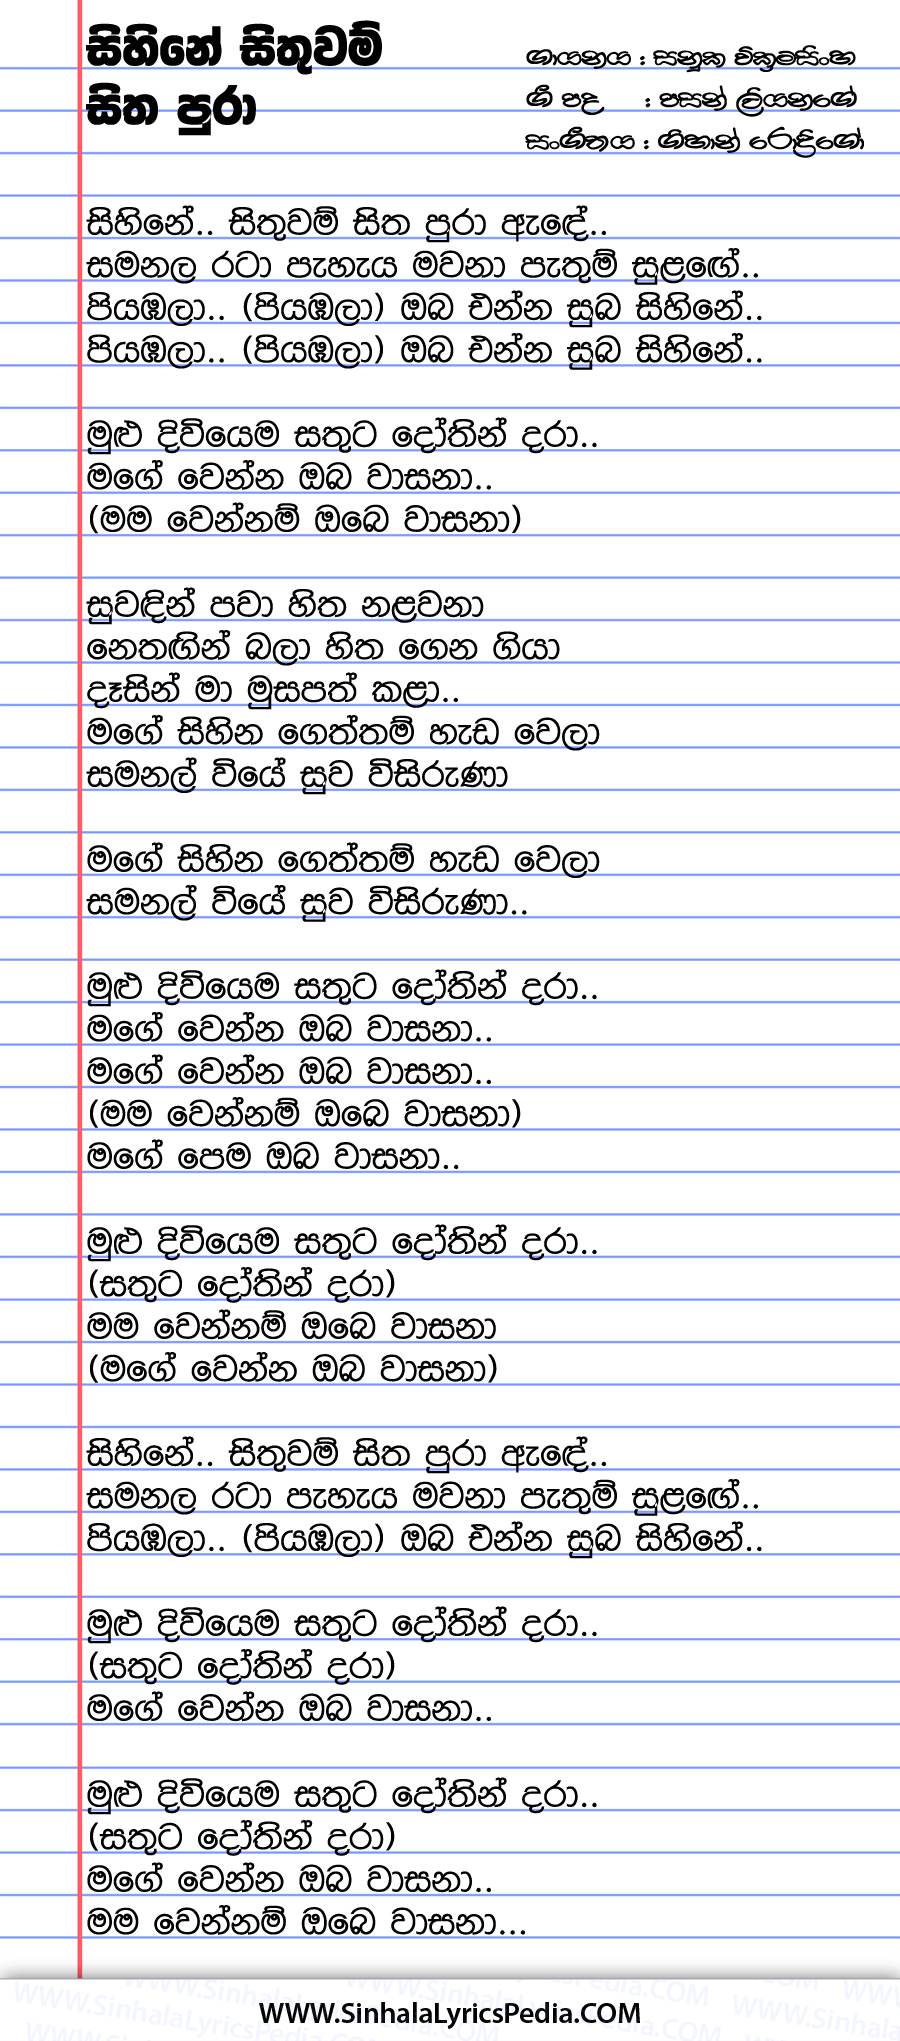 Sihine Sithuwam Sitha Pura Song Lyrics